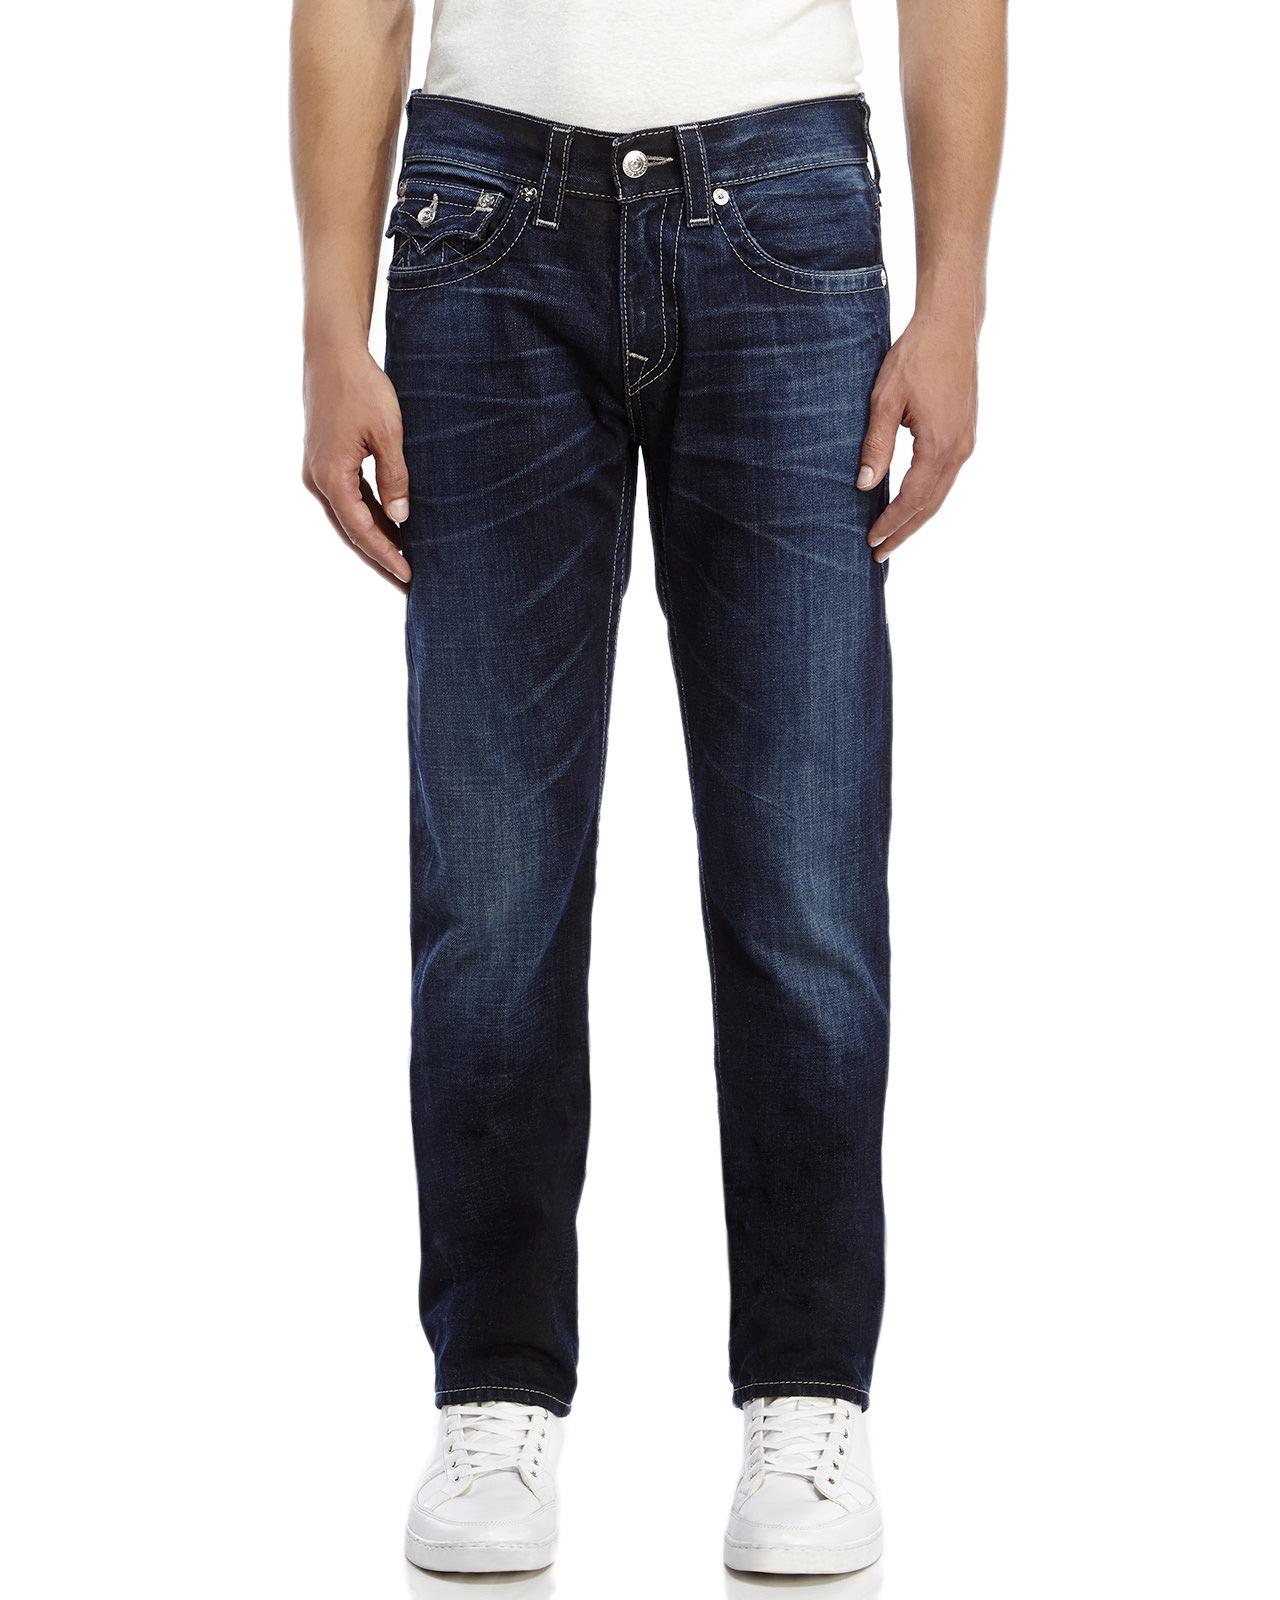 Lyst - True Religion Back Flap Pocket Jeans in Blue for Men